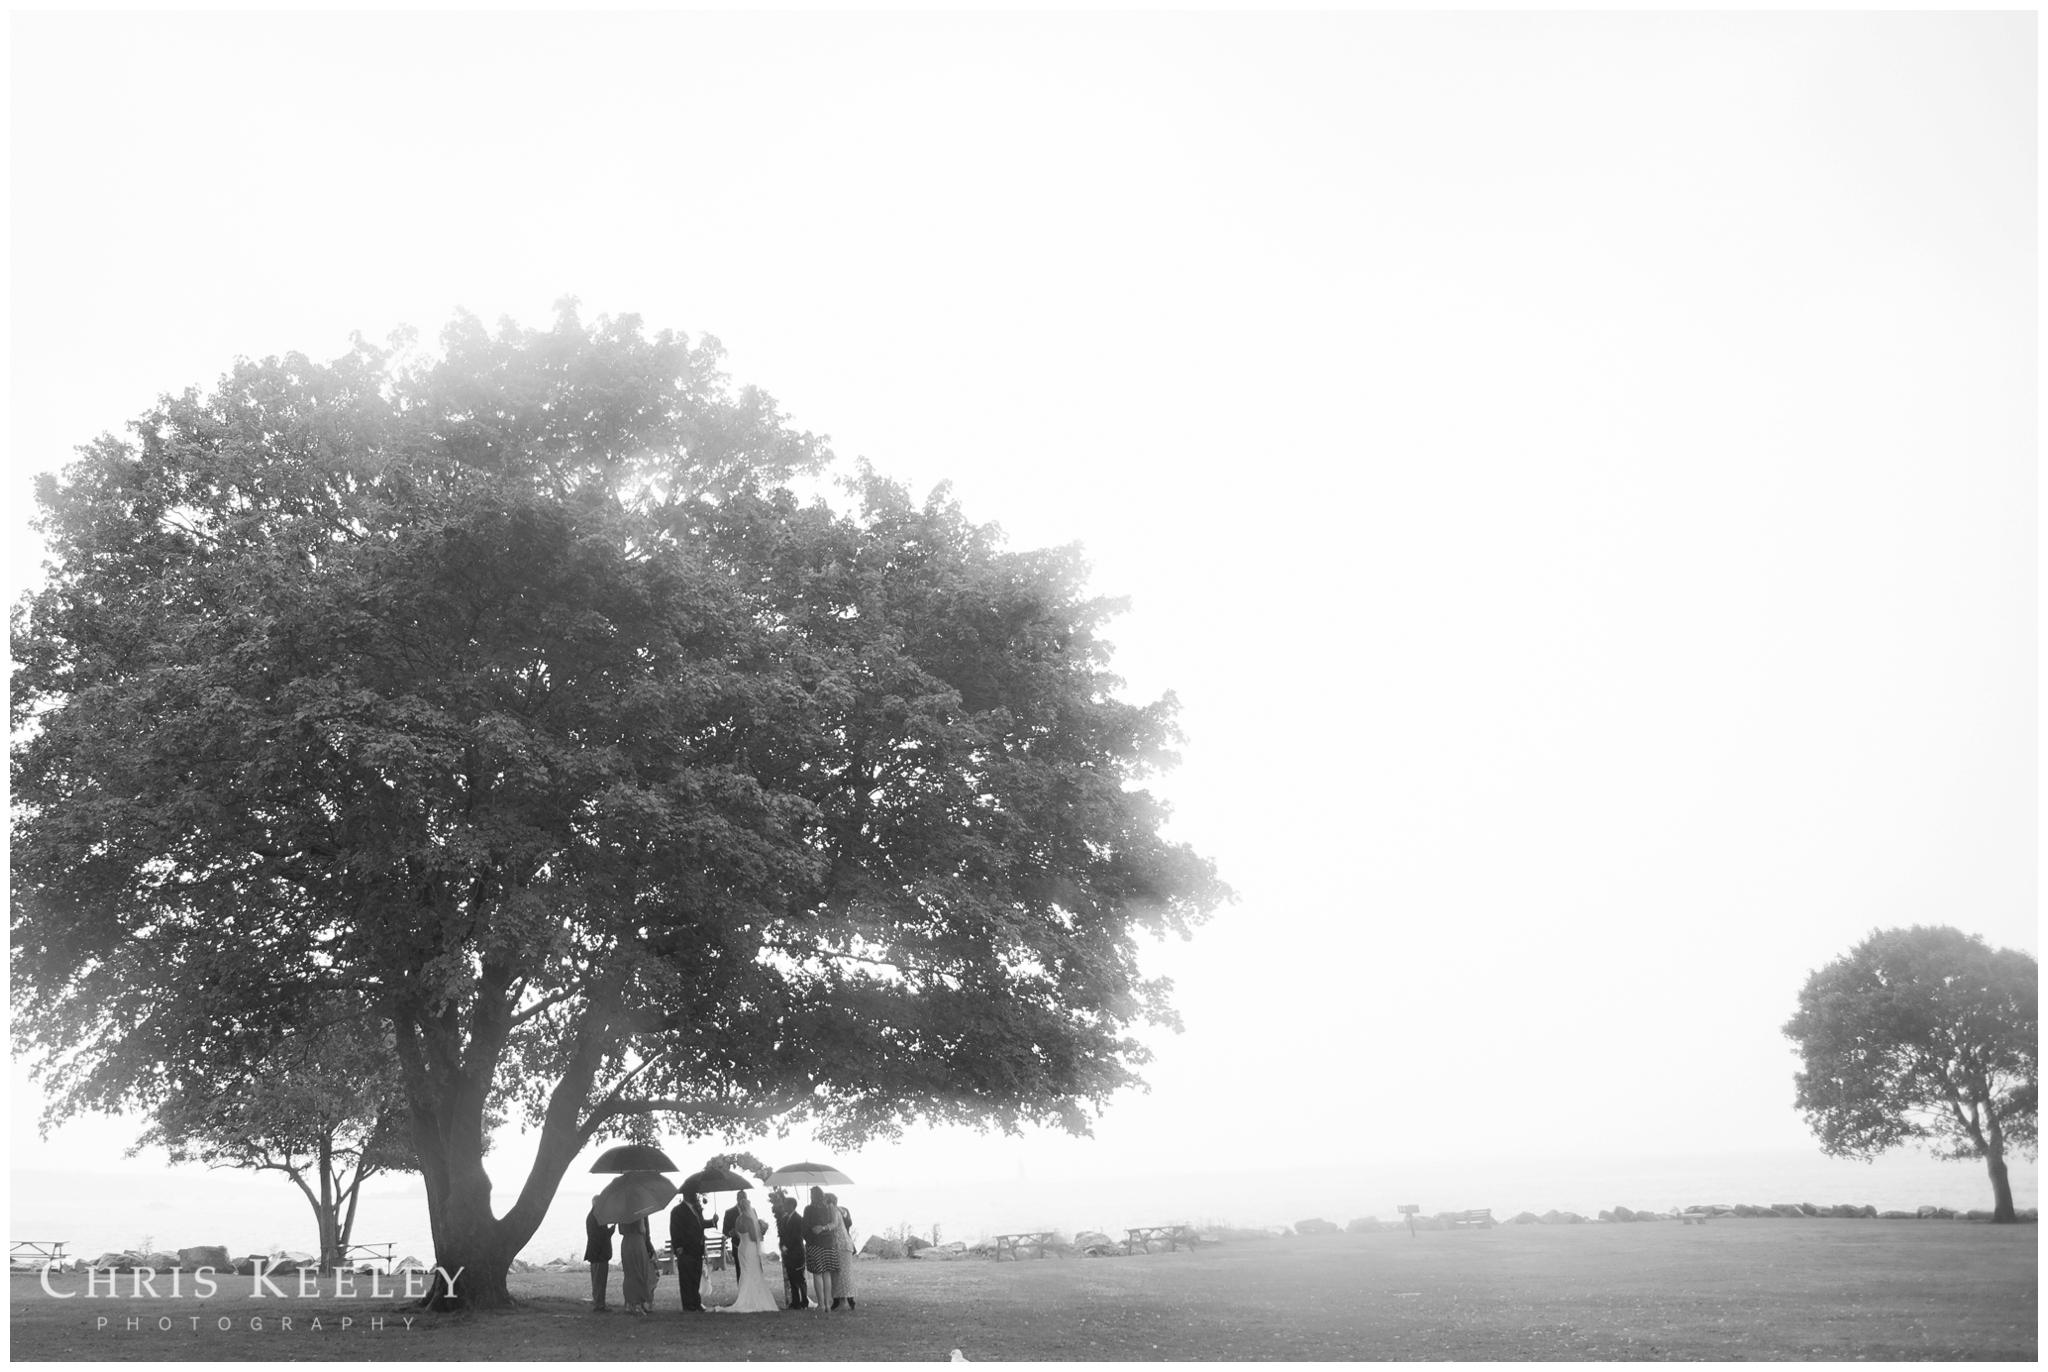 portsmouth-new-hampshire-fall-wedding-chris-keeley-photography-21.jpg